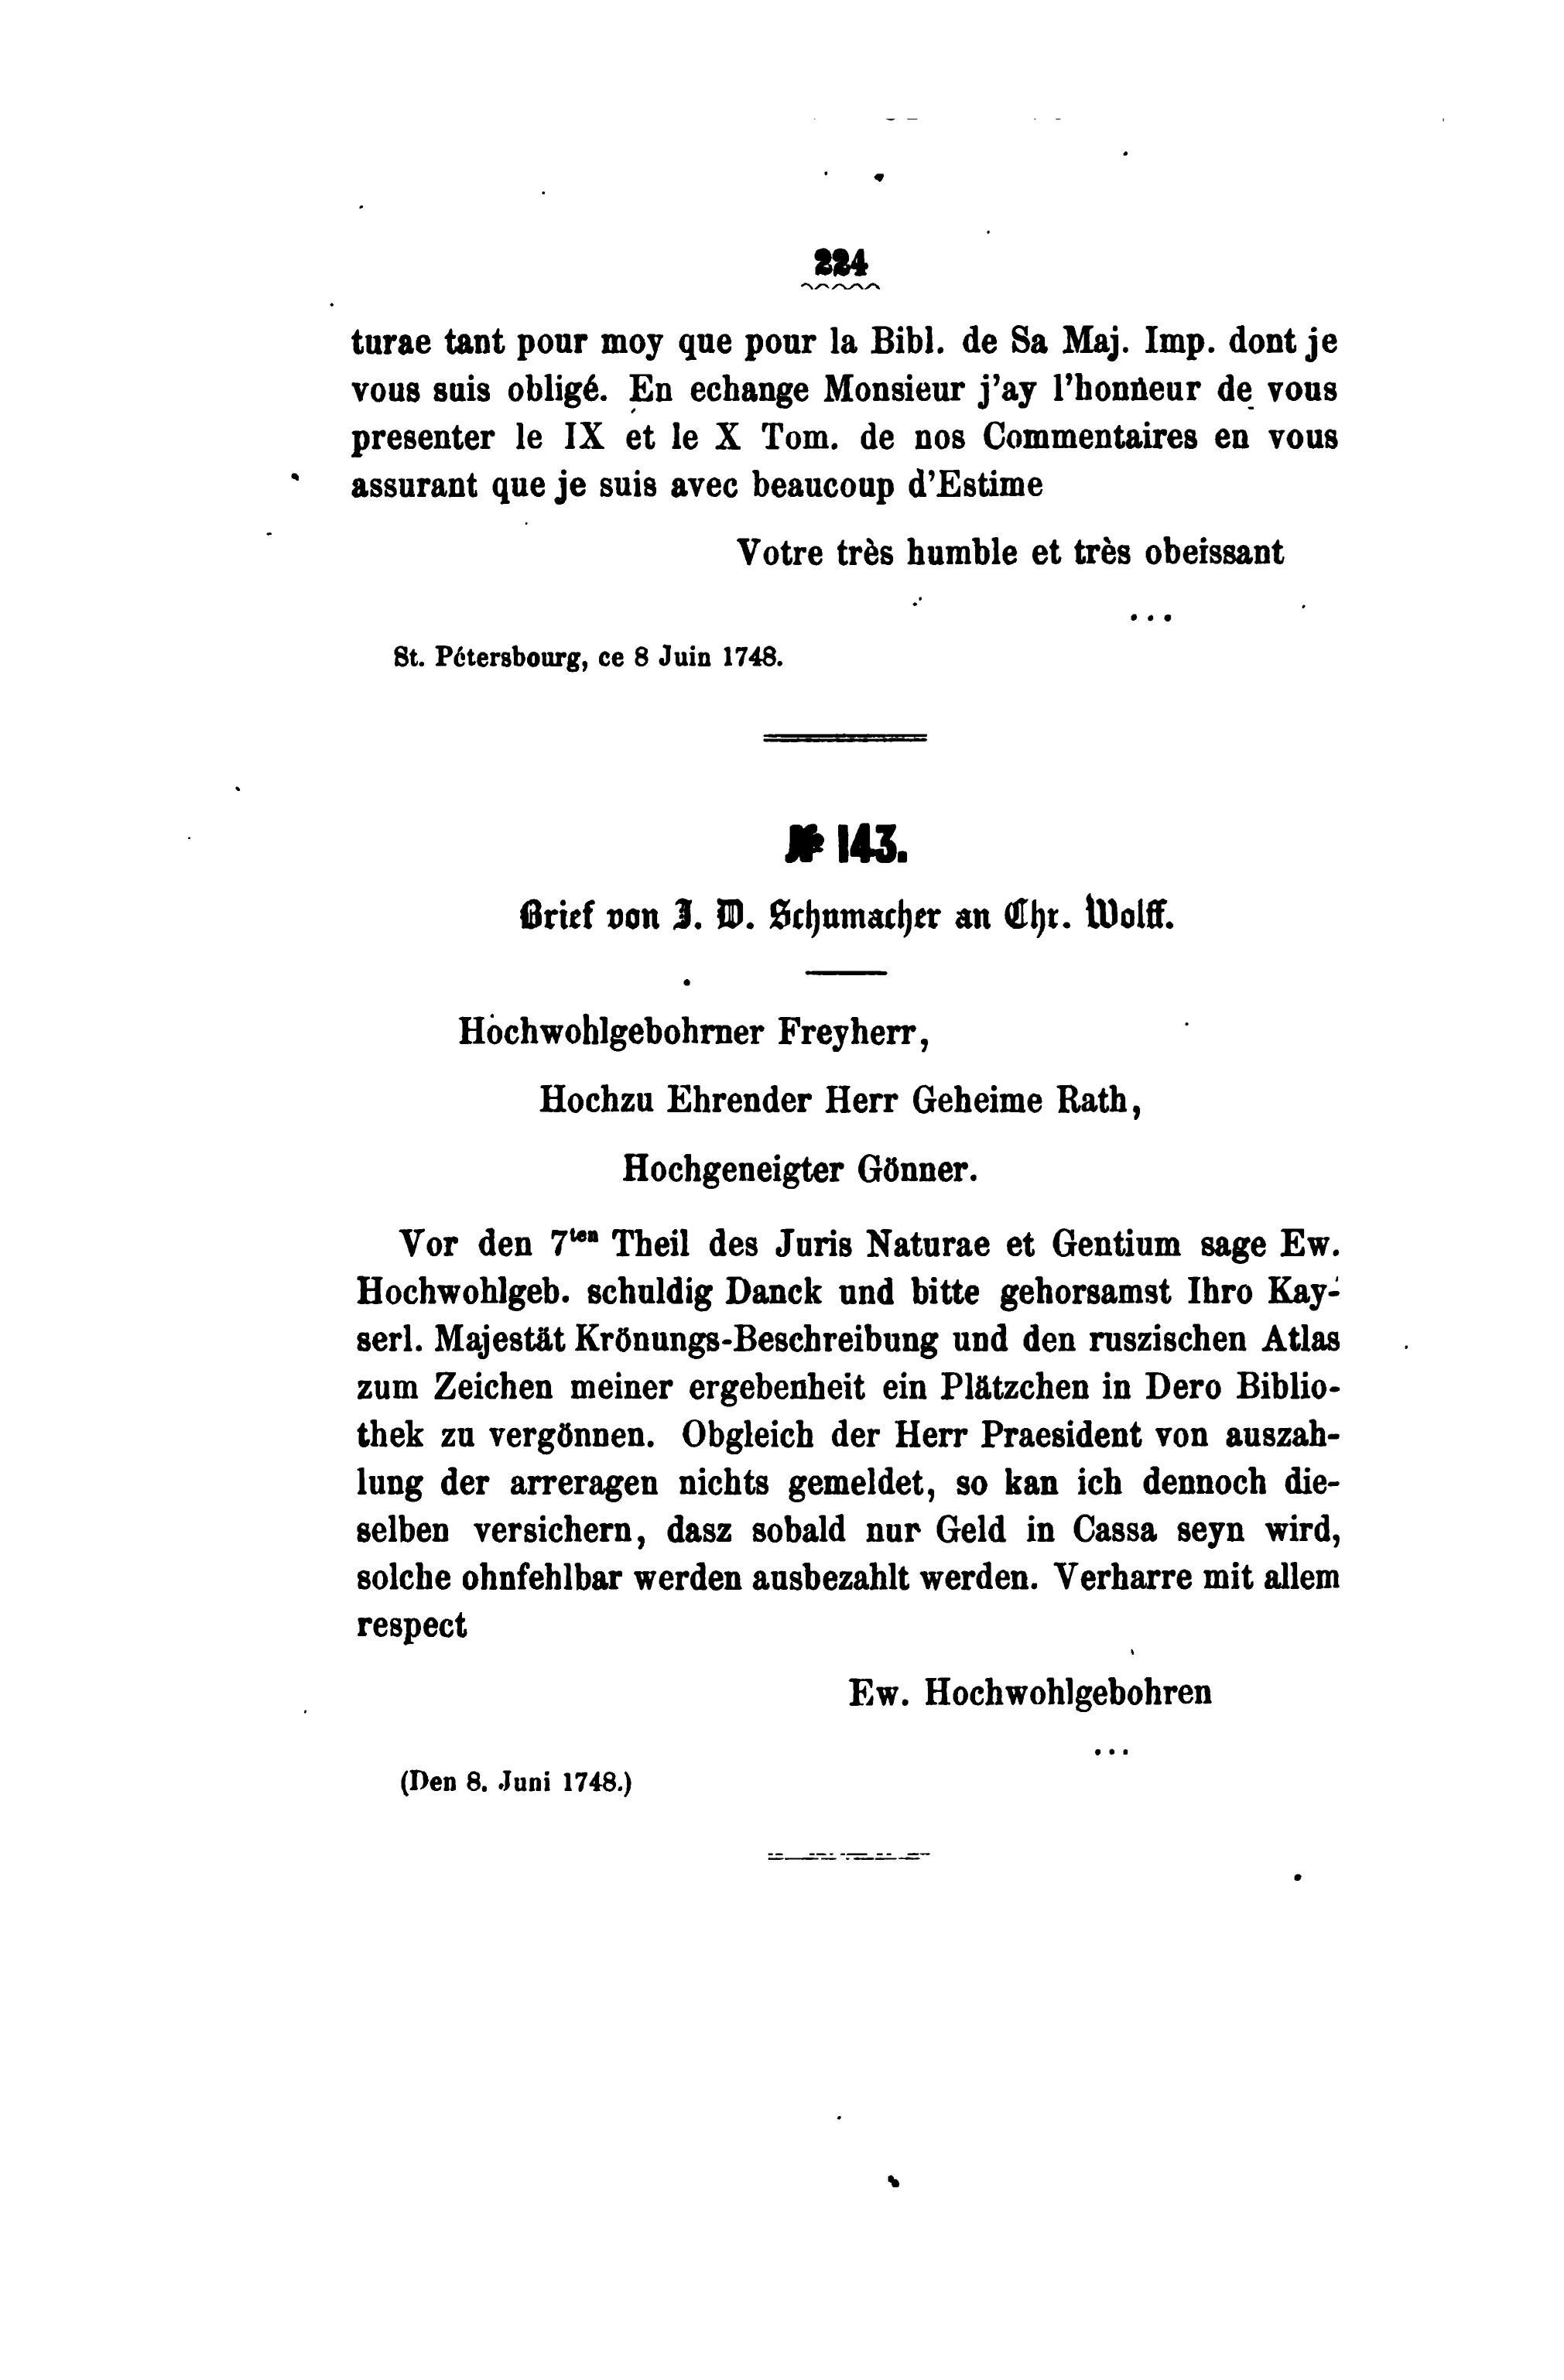 File:De Briefe Wolff 266.jpg - Wikimedia Commons